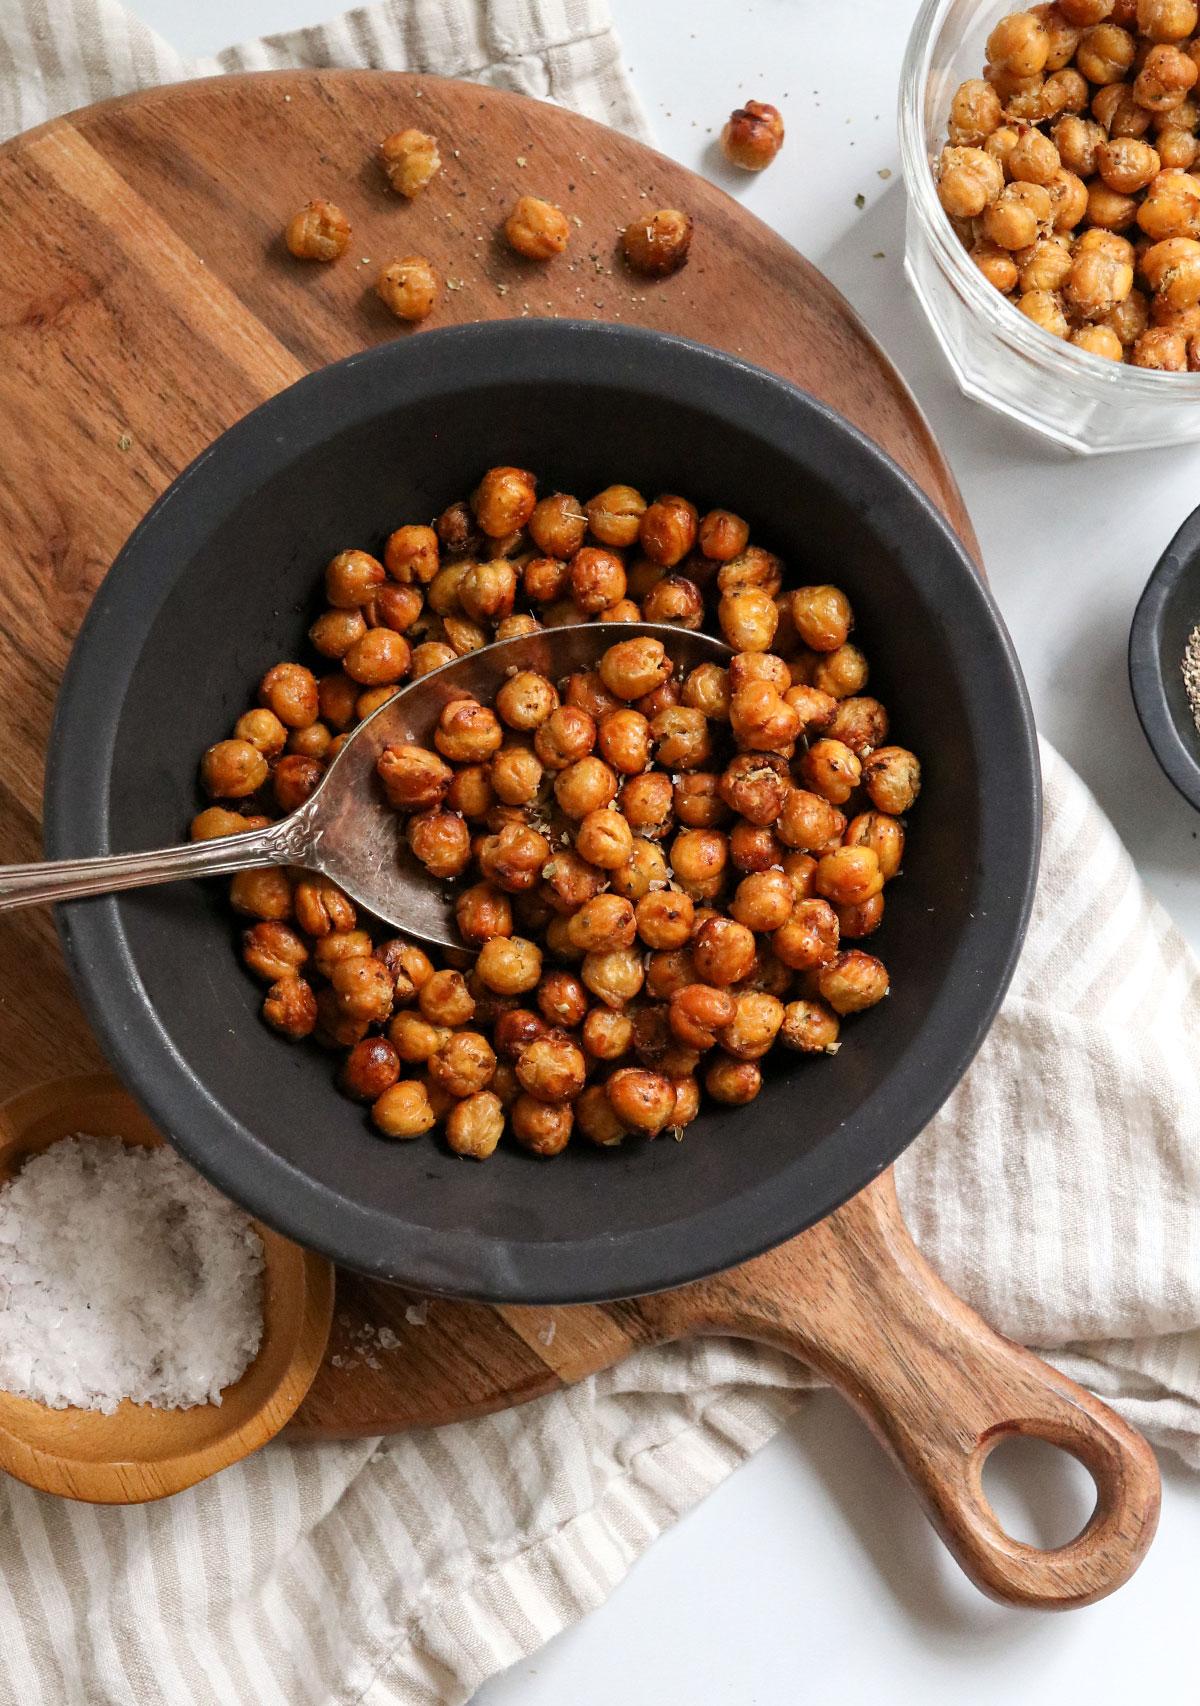 crispy air fryer chickpeas overhead in bowl